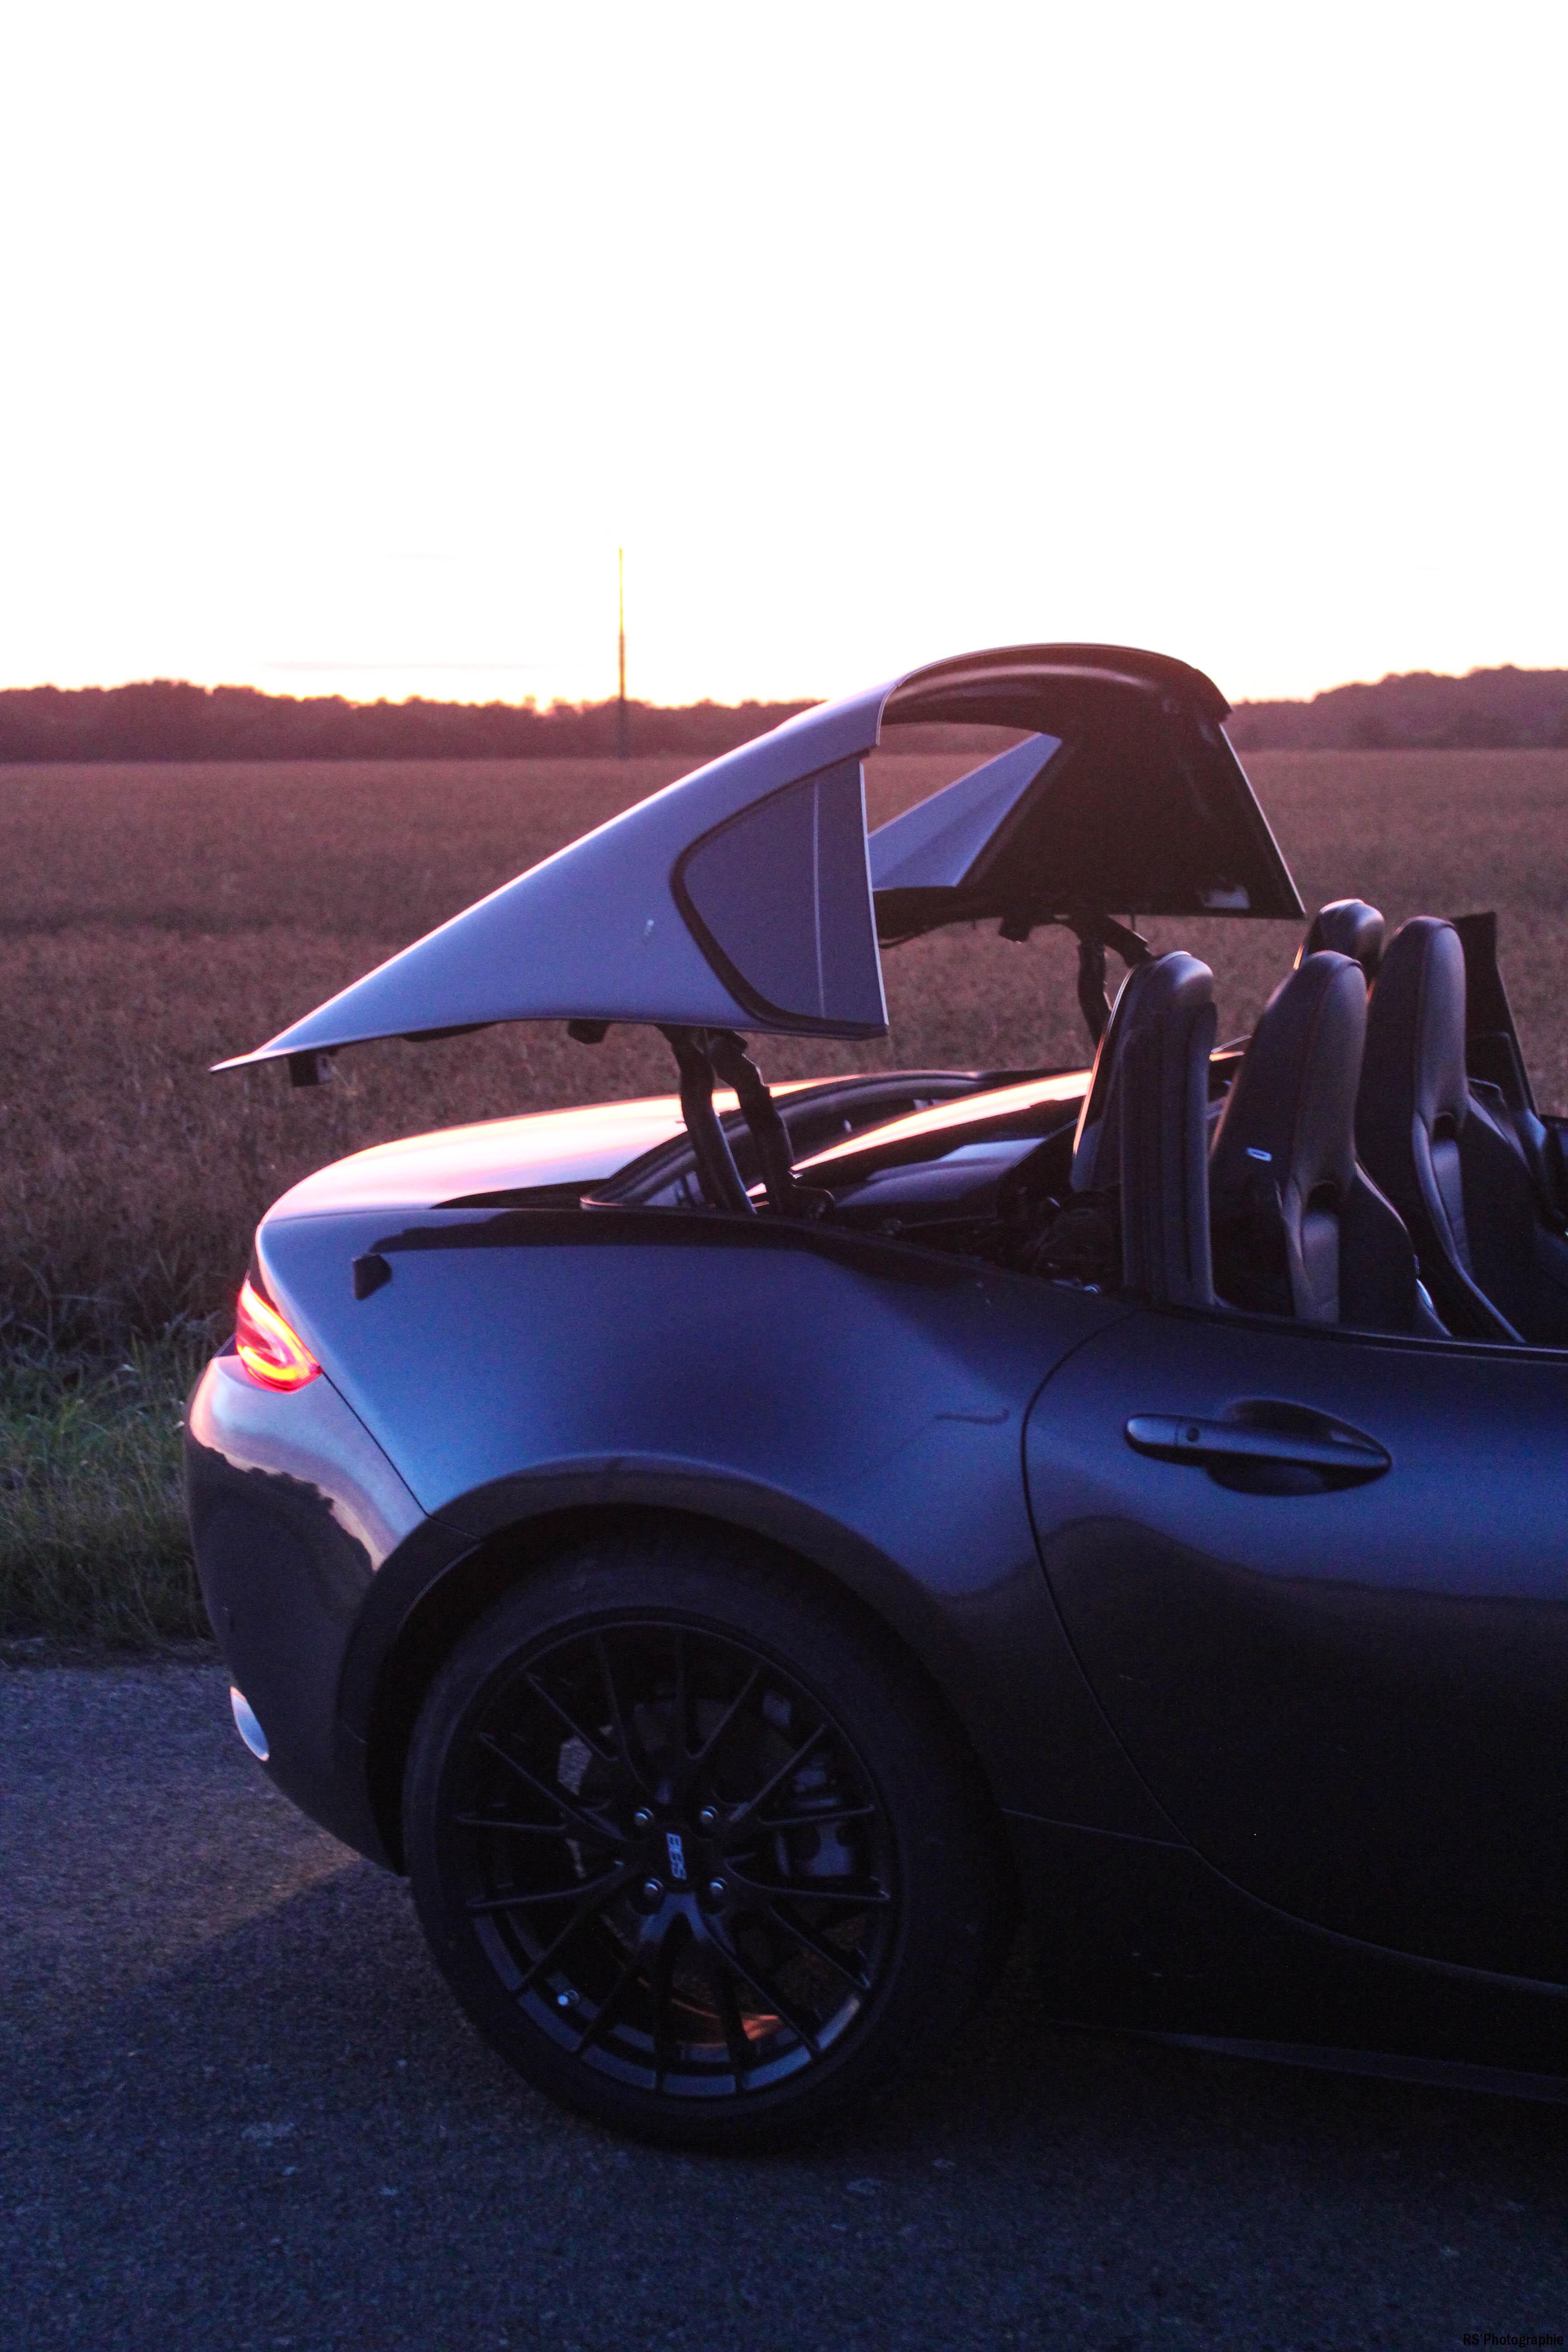 MazdaMX5RF30-mazda-mx5-rf-edition-profil-side-Arnaud Demasier-RSPhotographie